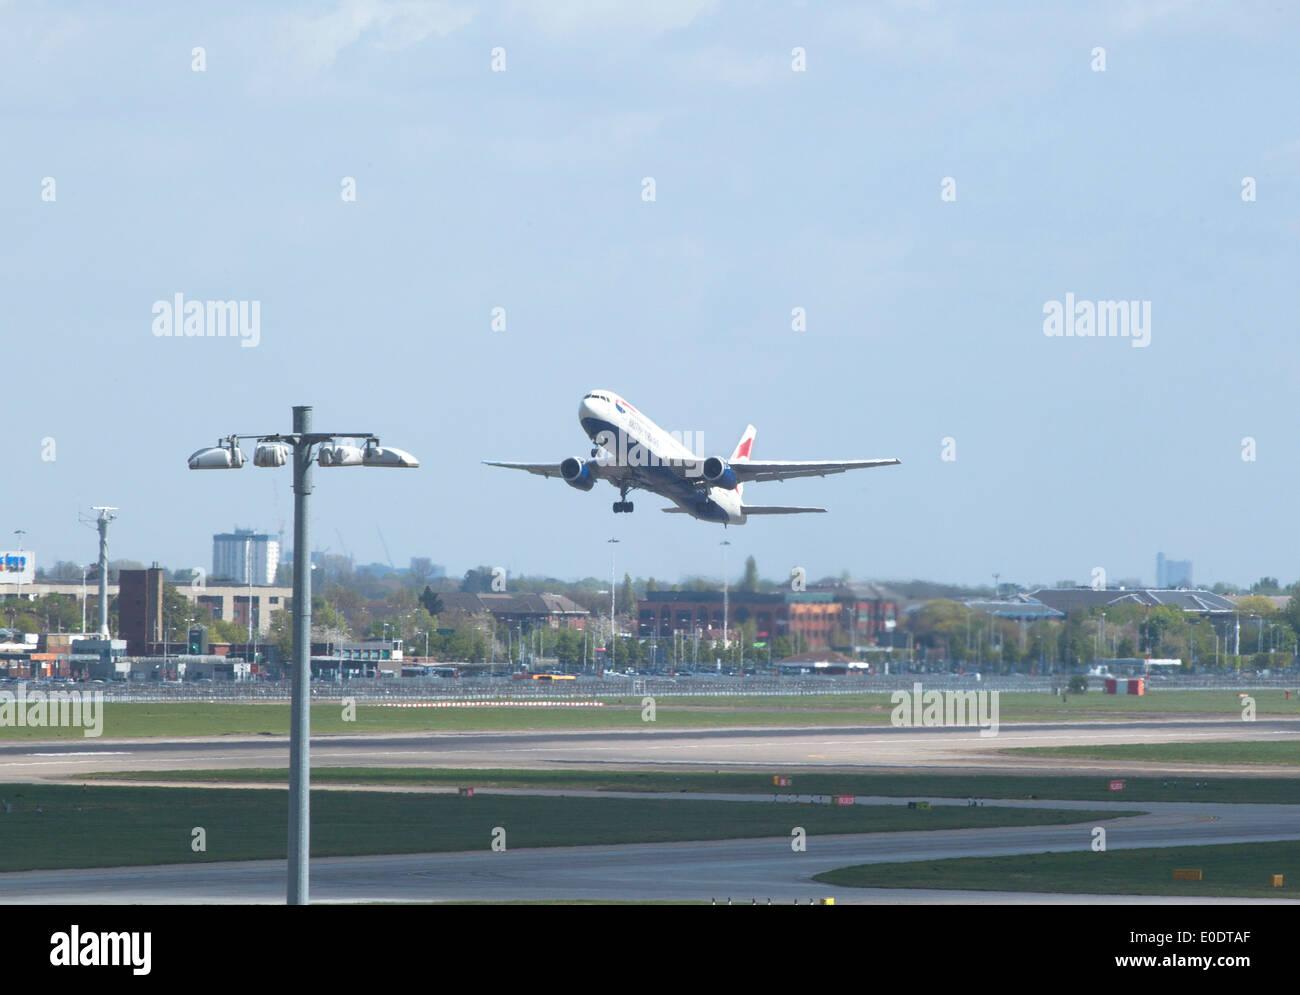 British Airways Boeing 757 takes off at Heathrow Airport runway - Stock Image